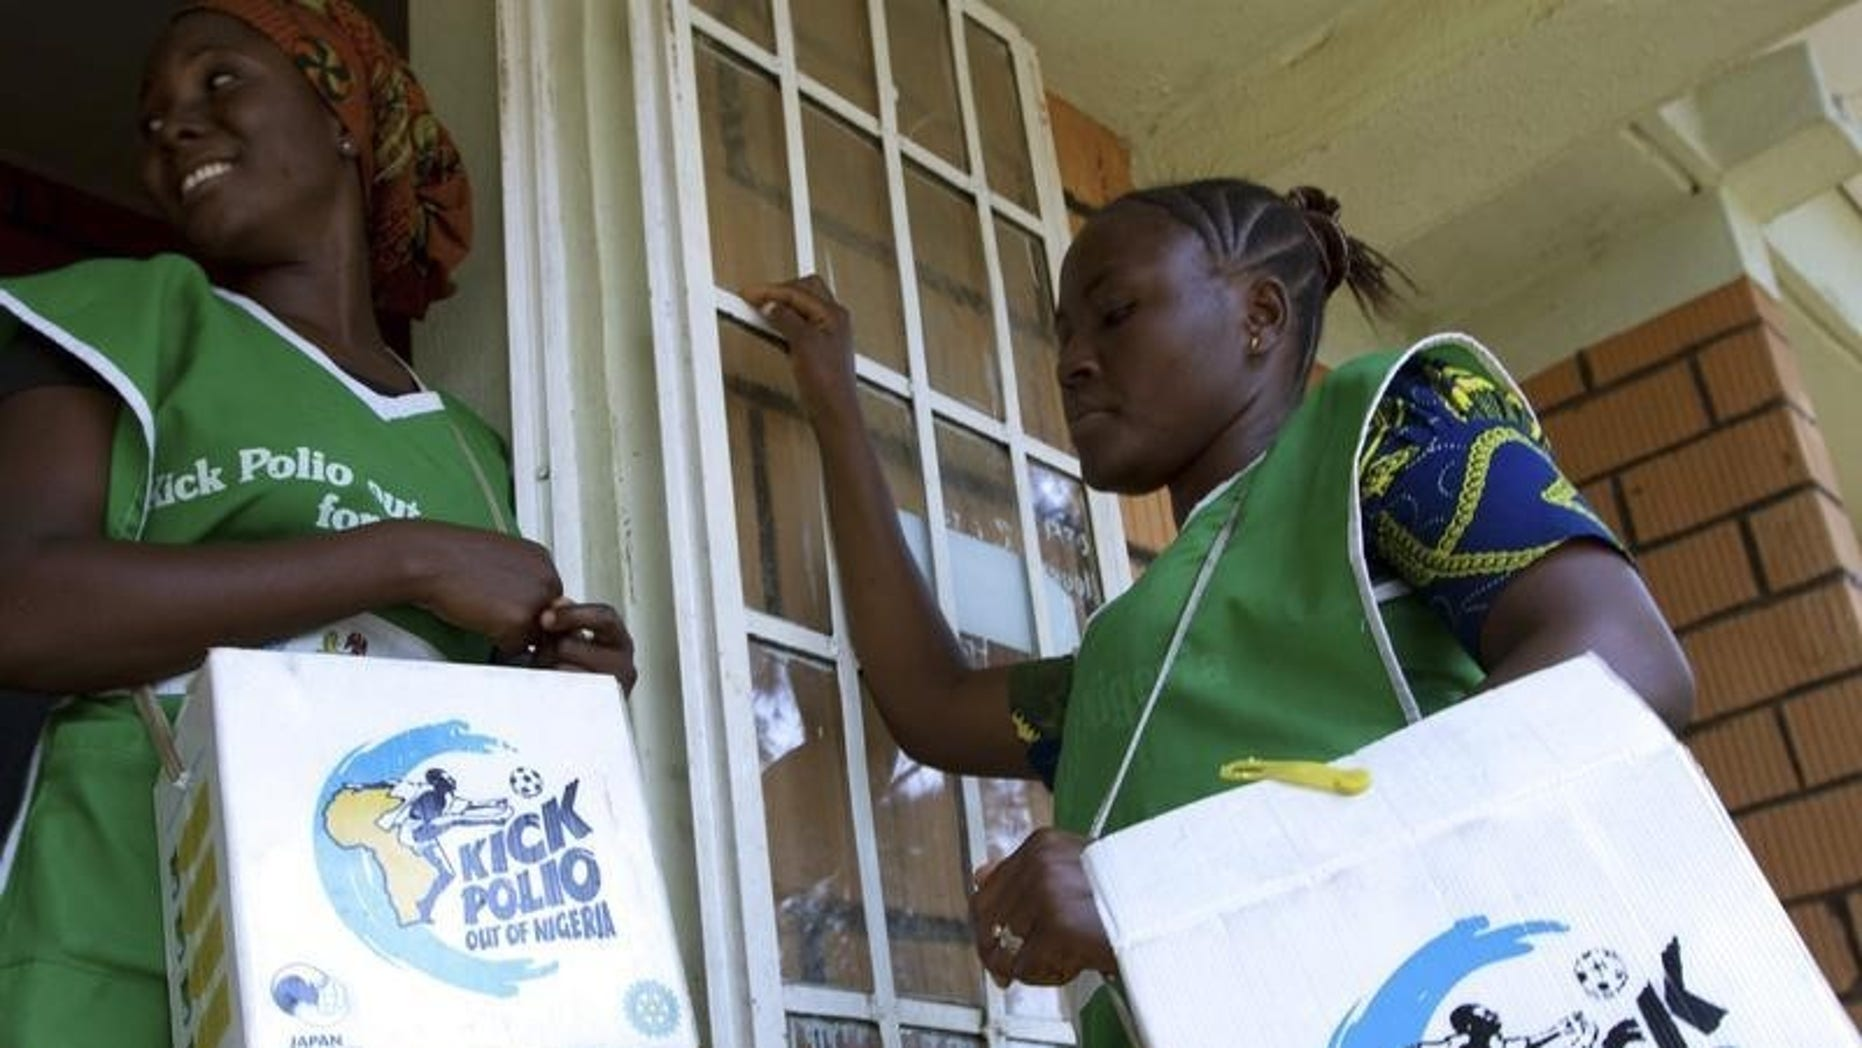 Volunteer Health officials wait to immunise children at a school in Nigeria's capital Abuja